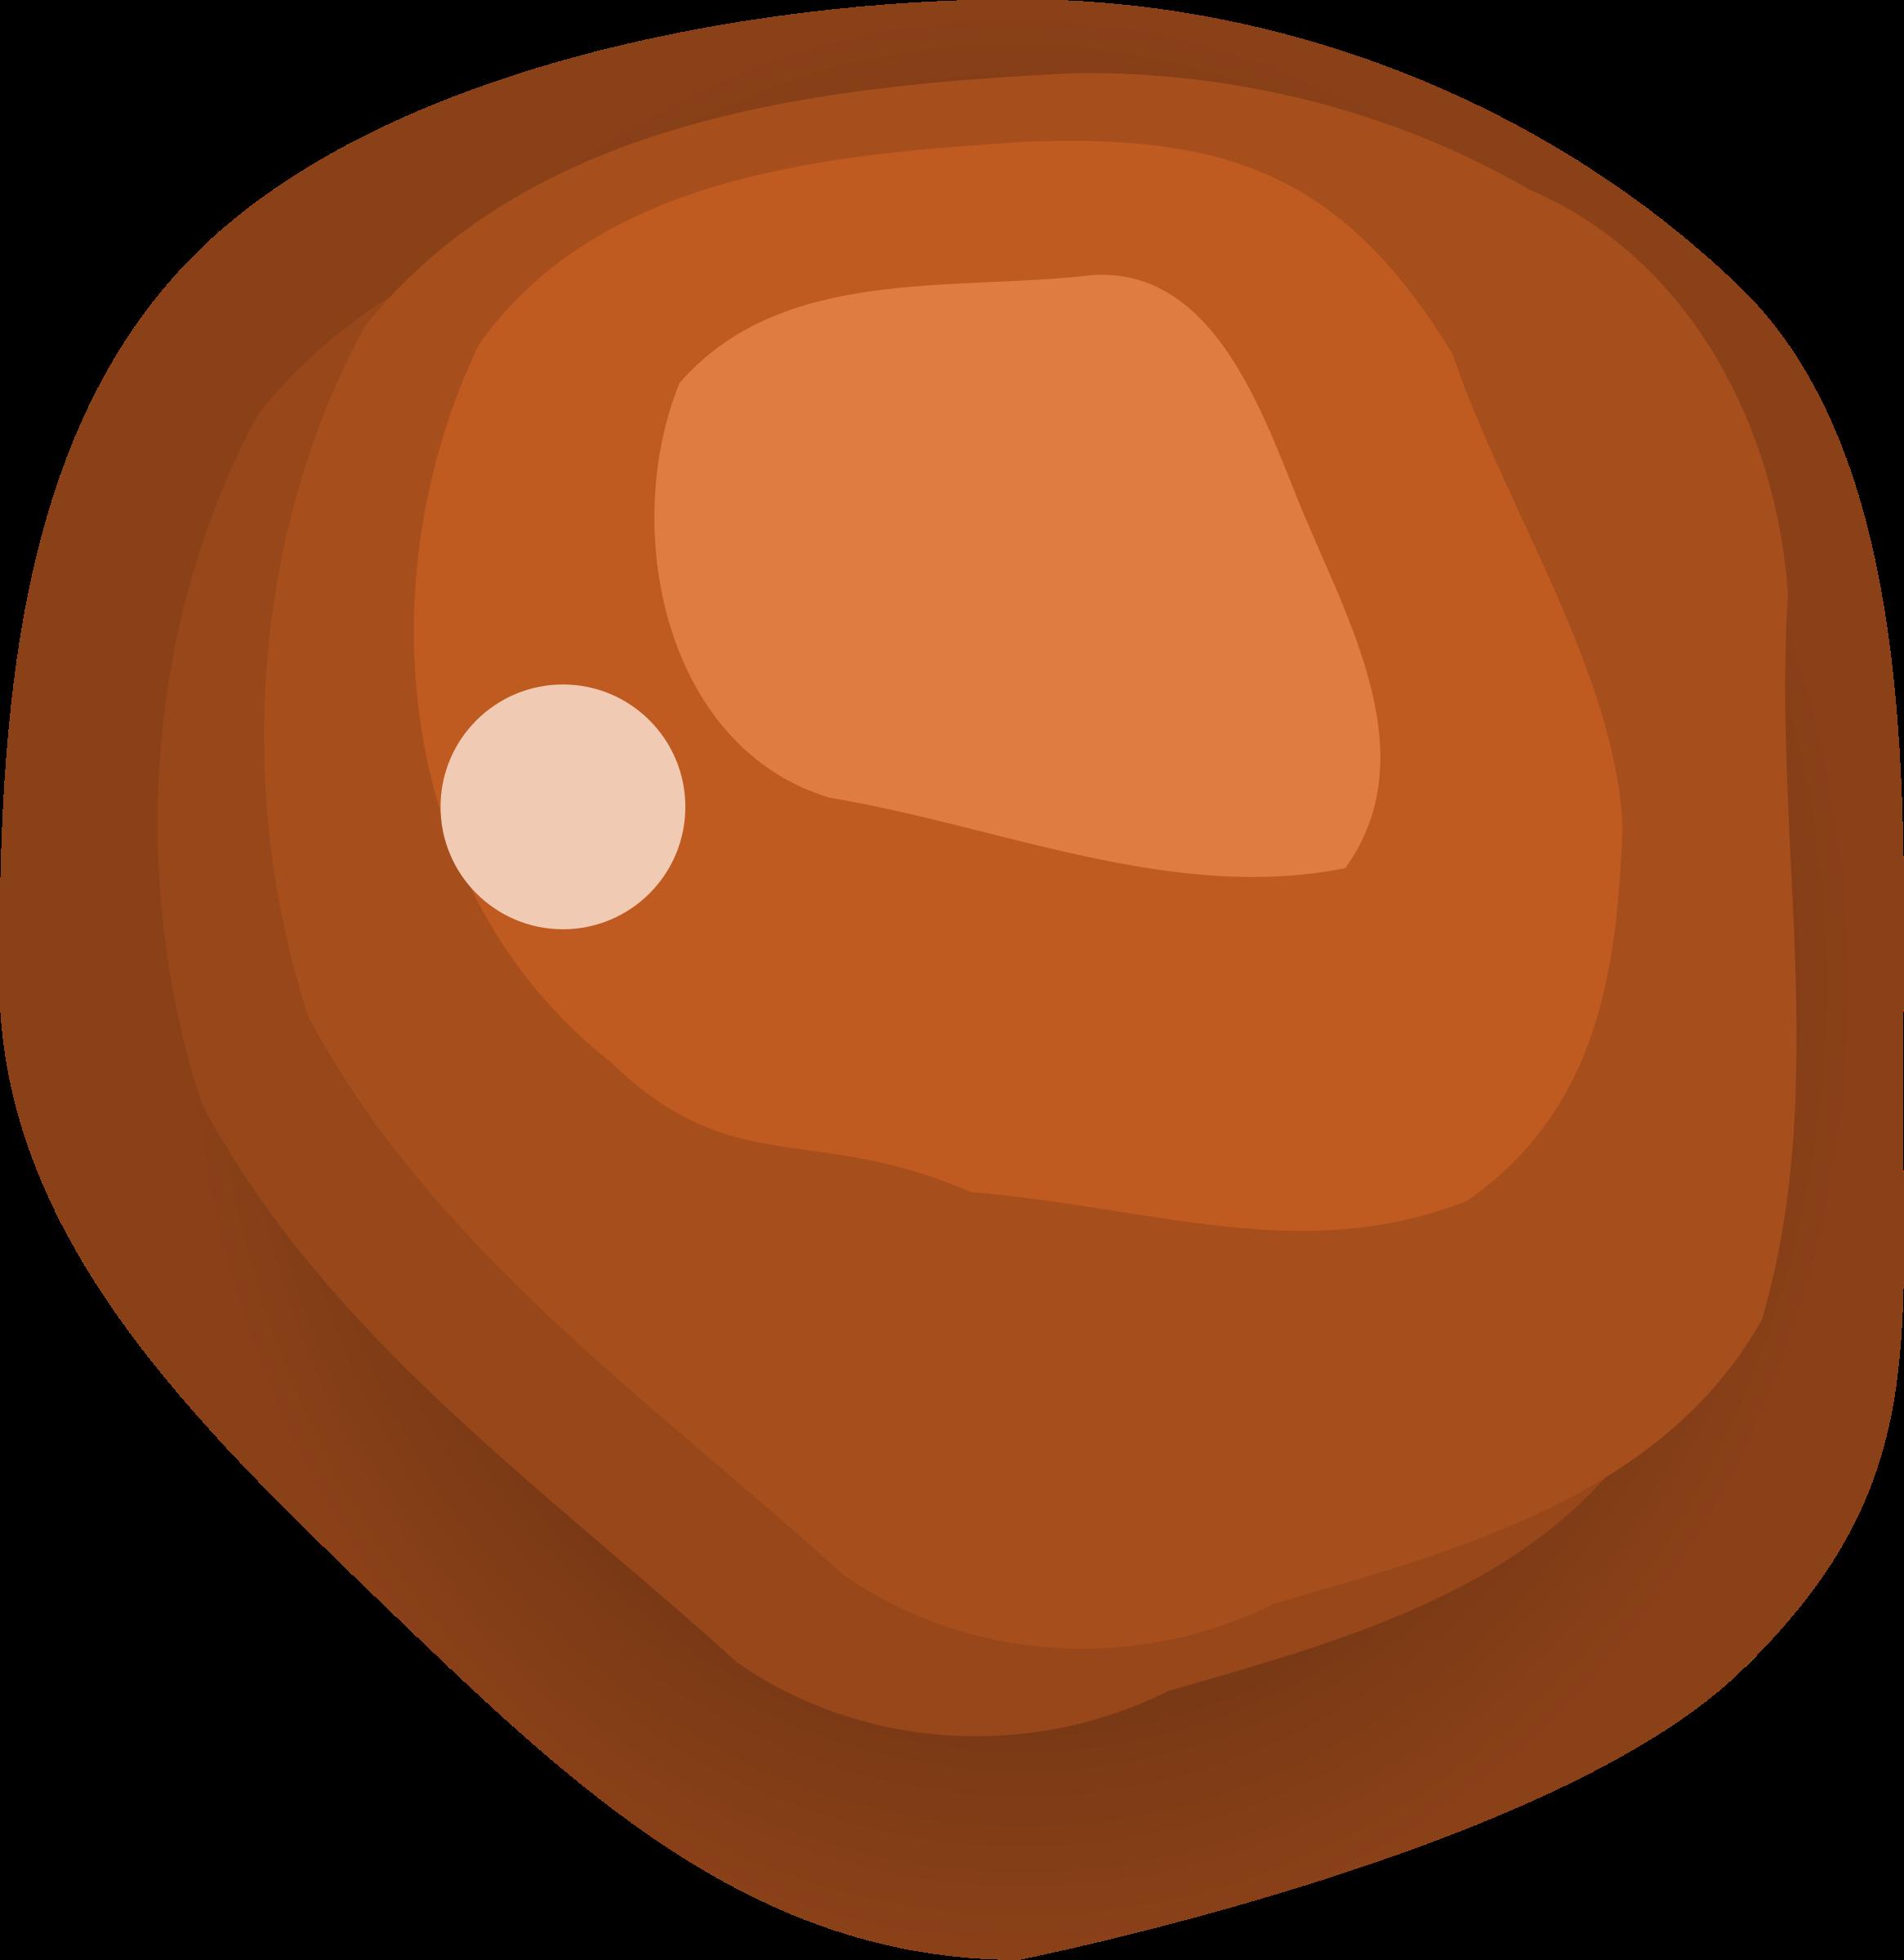 Mars suface